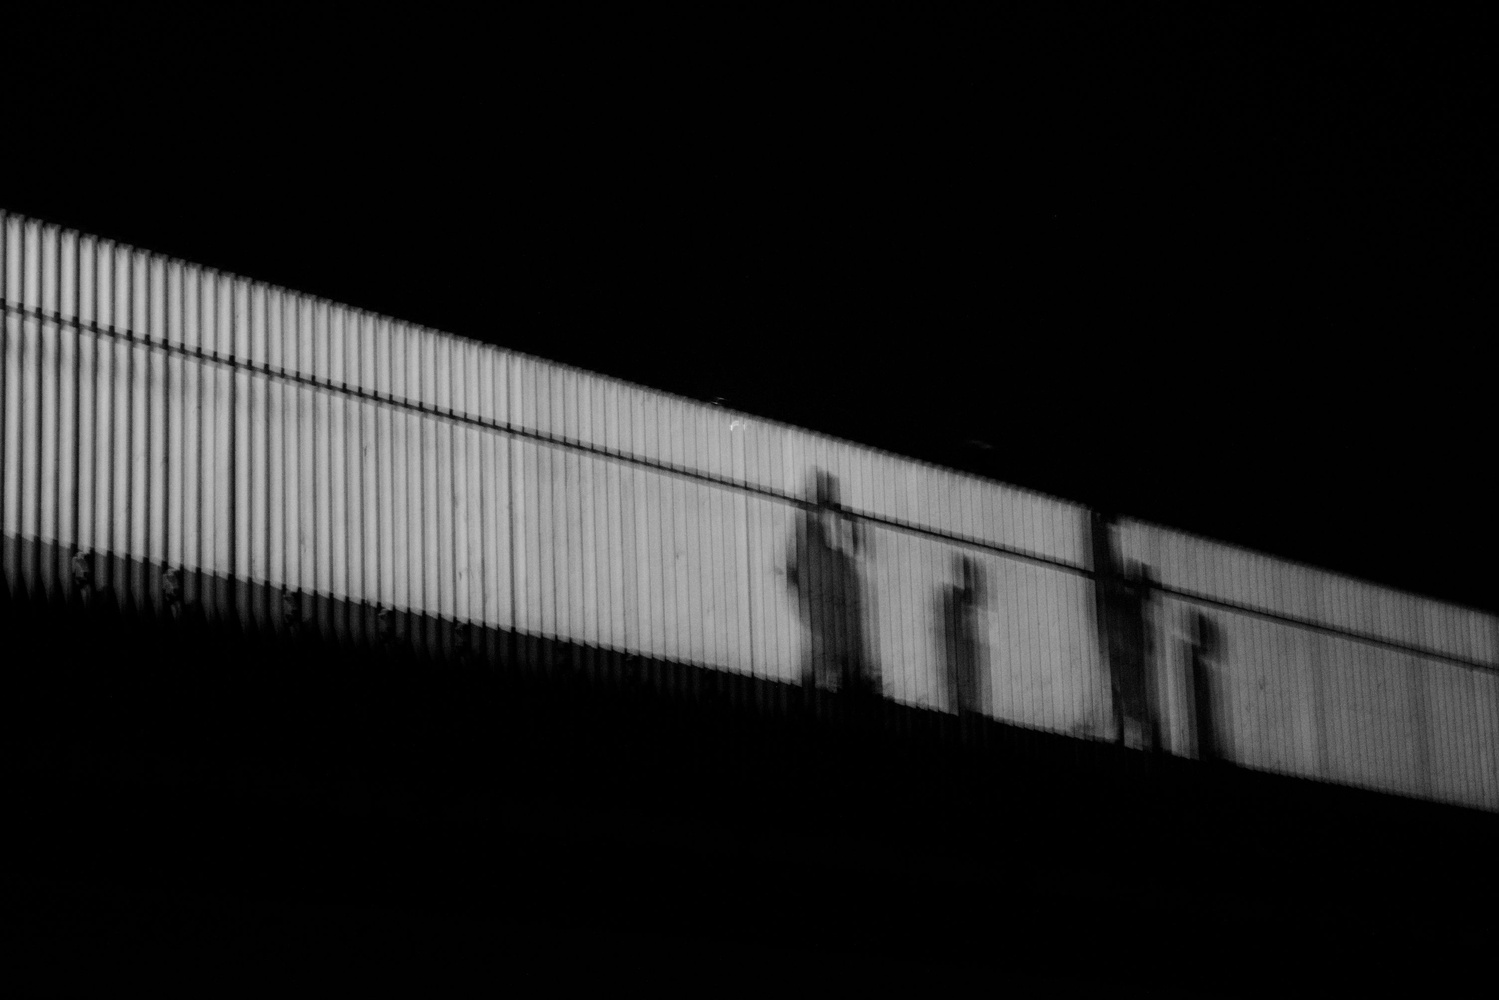 Humans by Alex Sokolovs